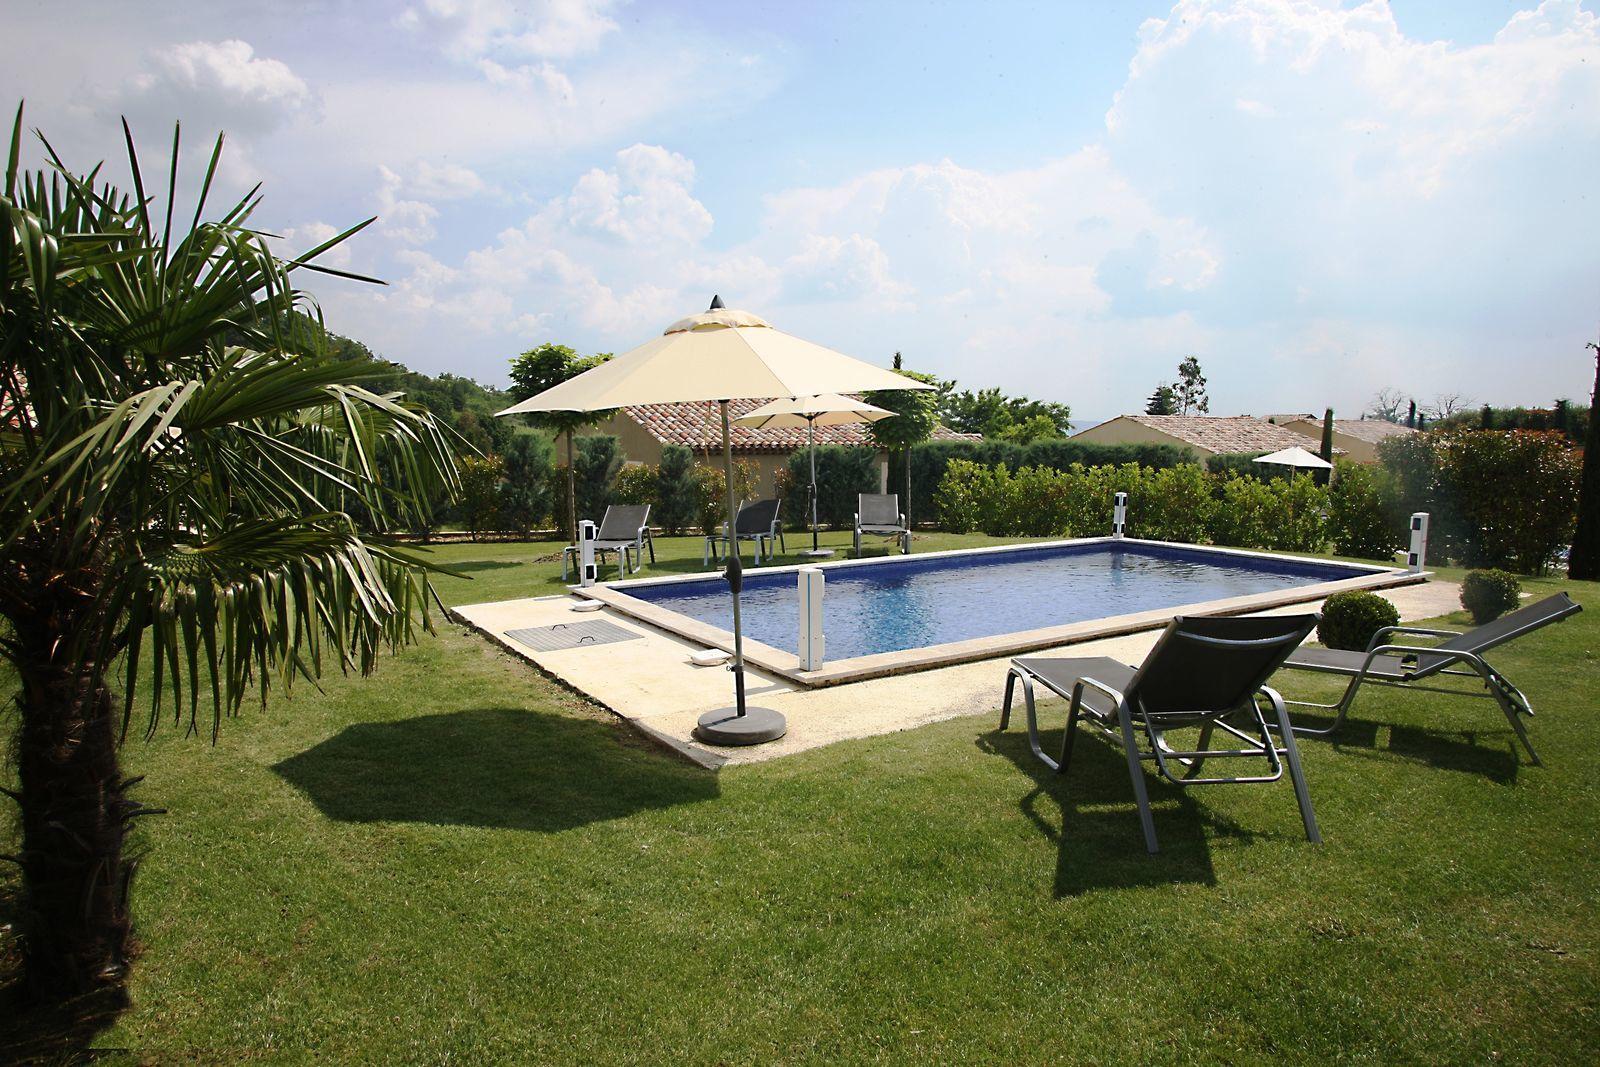 Park Beaudine - vakantiewoning T3 met verwarmd prive-zwembad